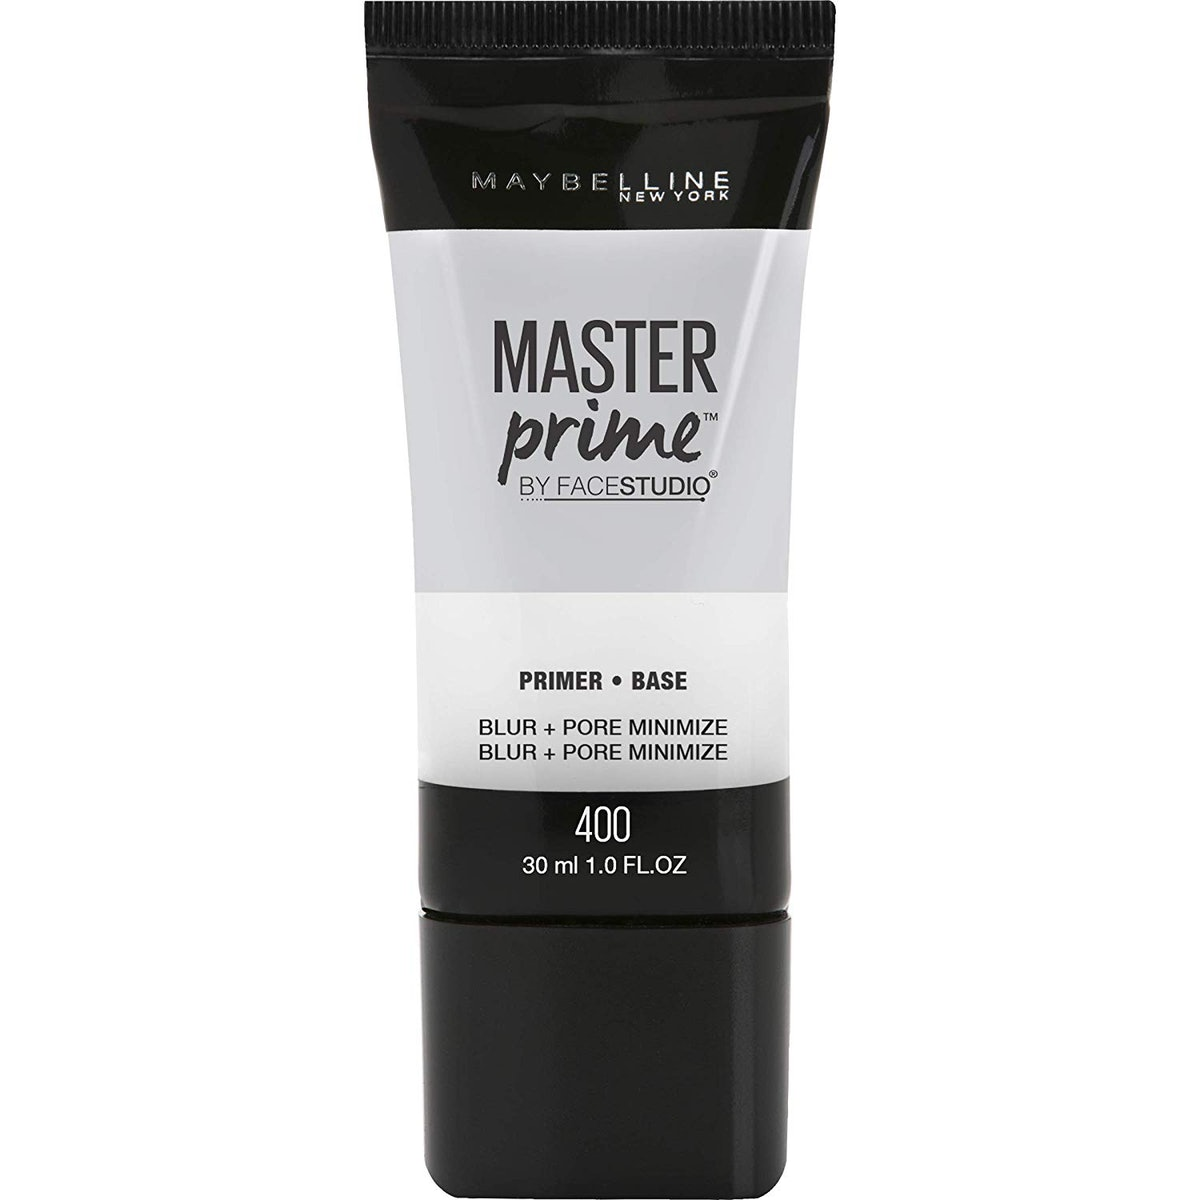 Maybelline New York Master Prime Blur + Pore Minimize Primer + Base